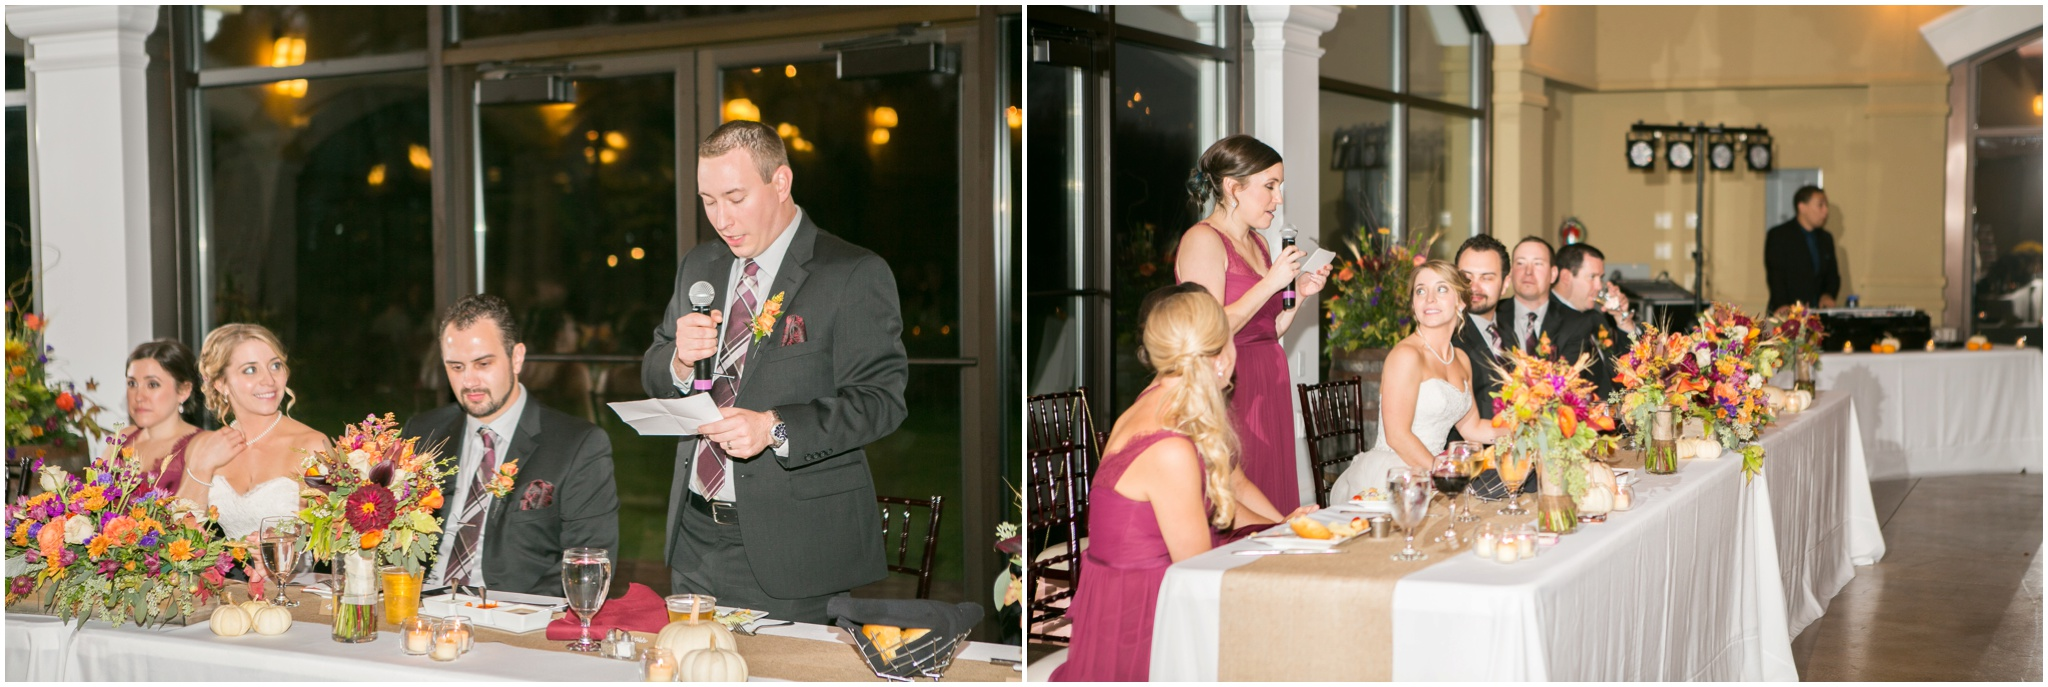 DC_Estate_Winery_Wedding_Beloit_Illinois_Wedding_0080.jpg